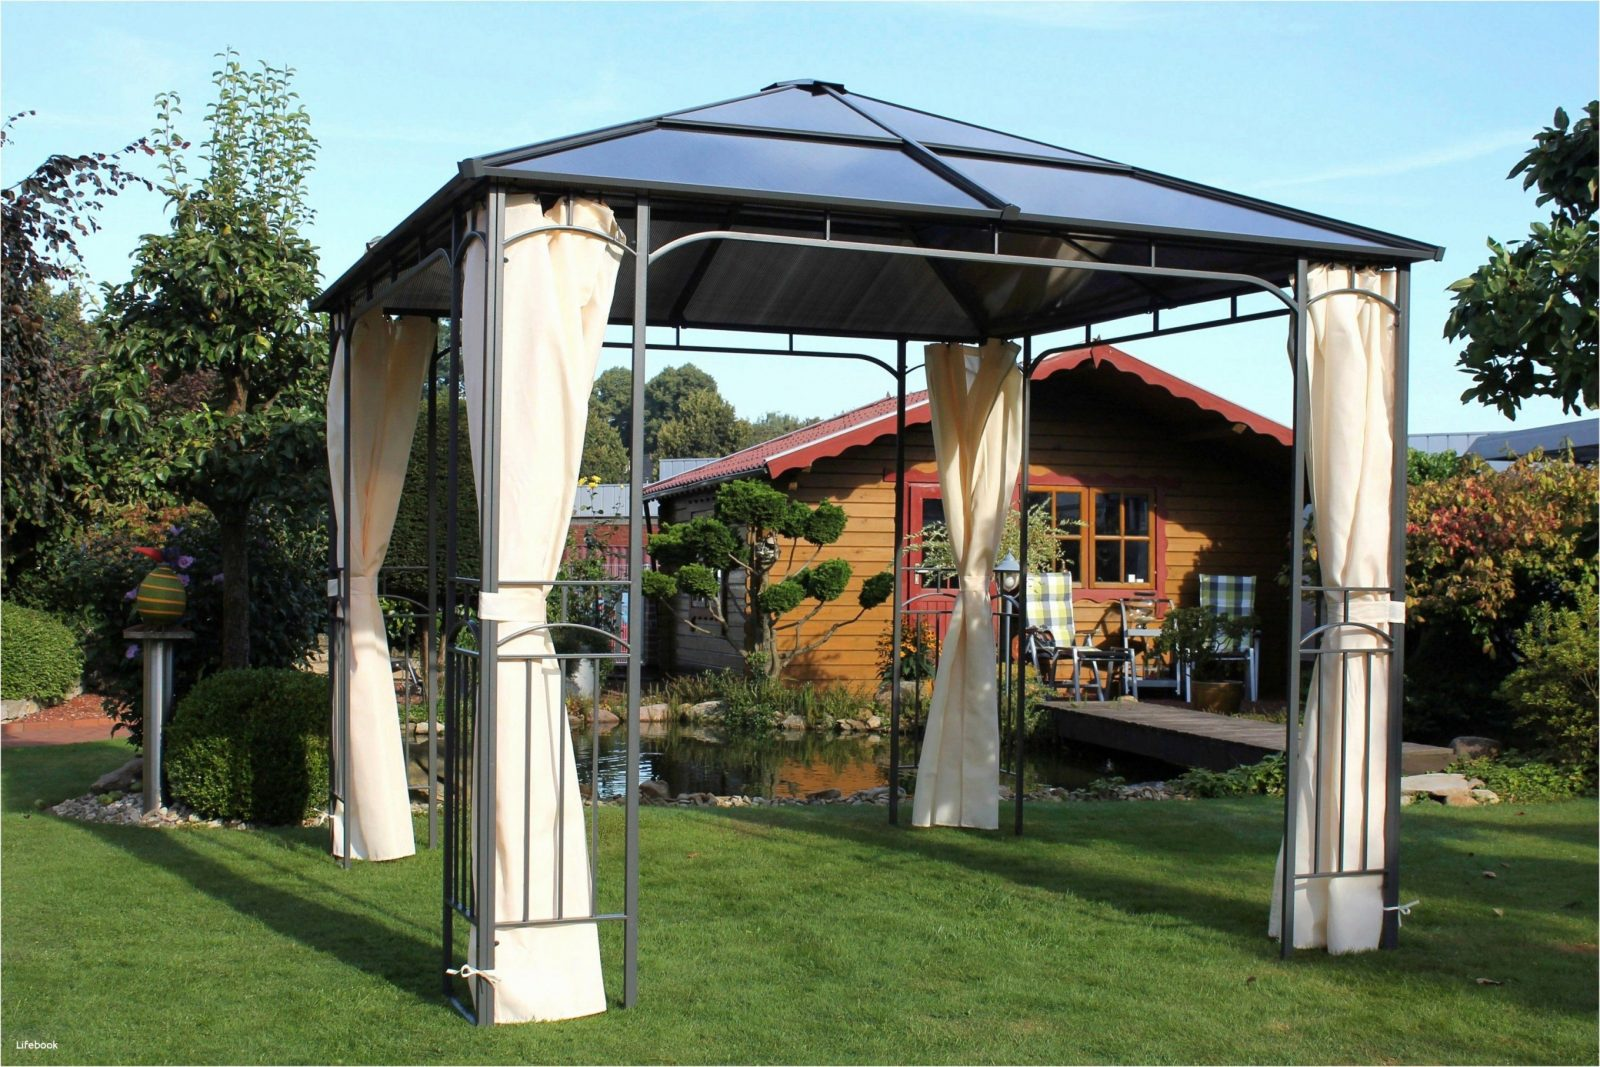 Ersatzdach Pavillon 3X3 Hornbach Für Design Pavillon 3X3 Wasserdicht von Pavillon 3X3 Wasserdicht Bauhaus Bild